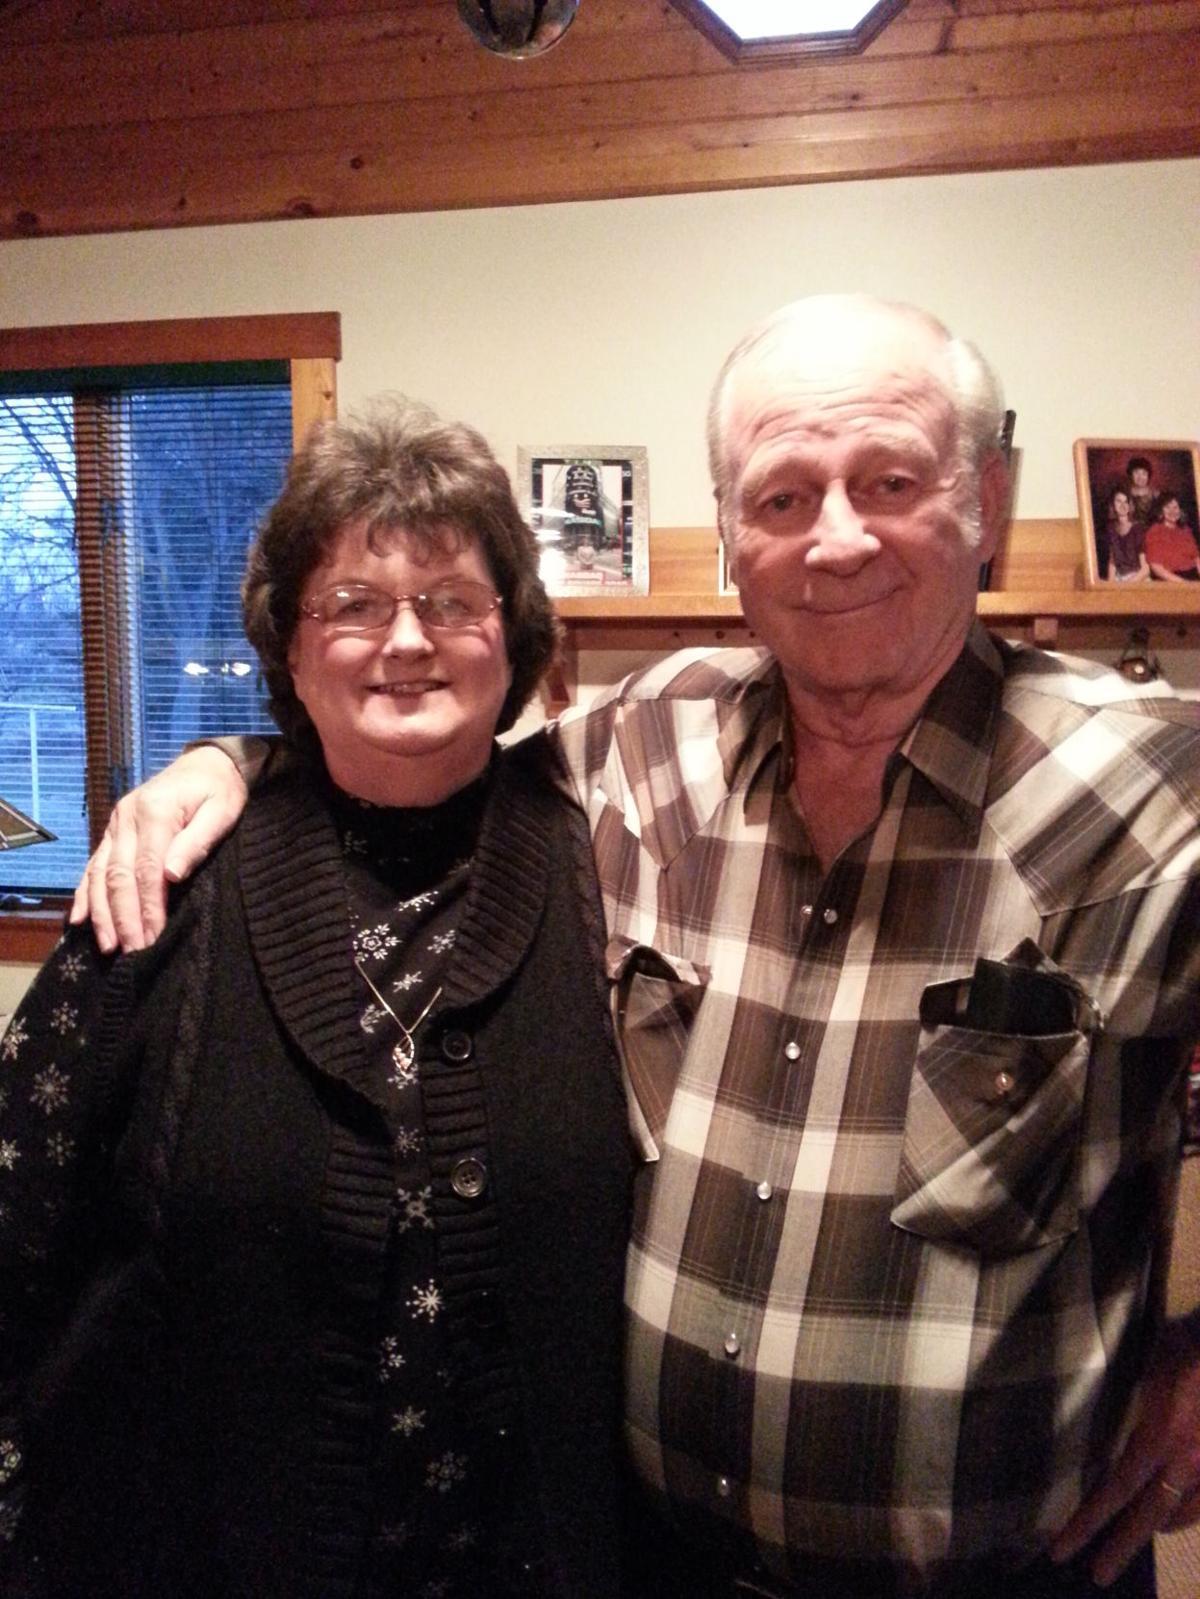 Charles and Raven James celebrate 50th wedding anniversary